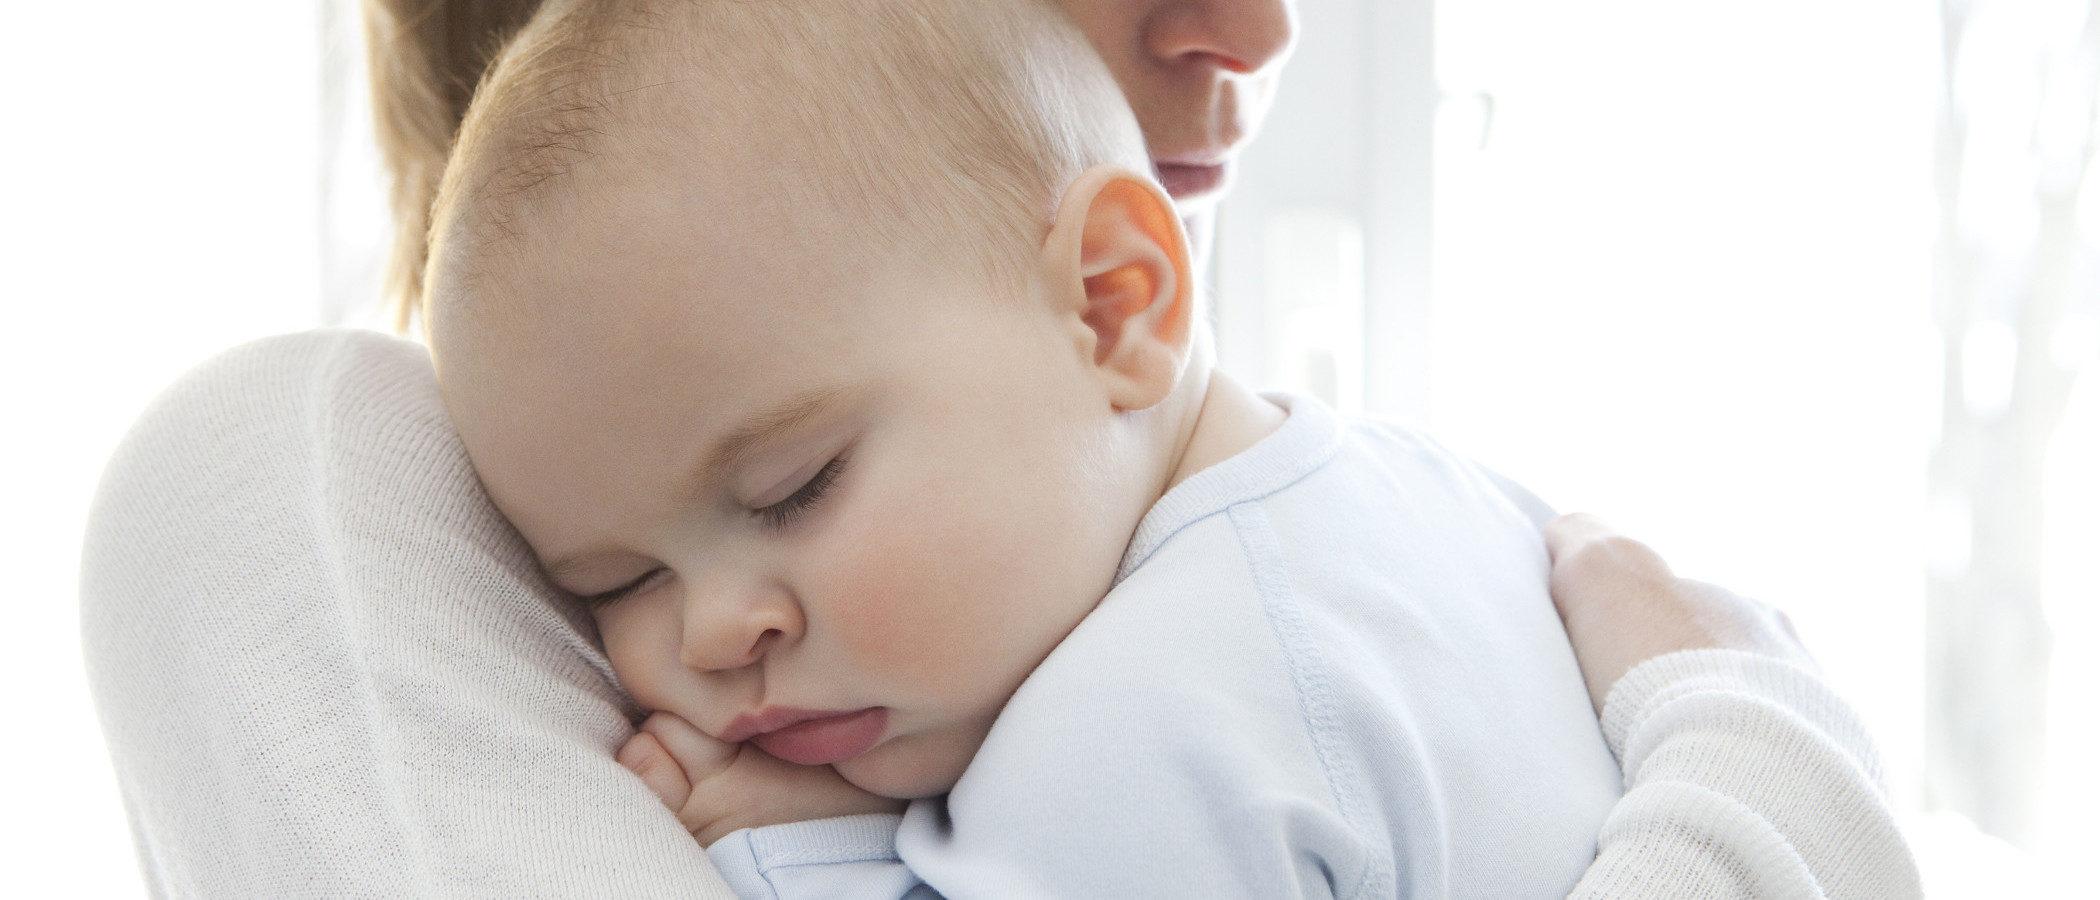 Consejos para dormir a los bebés